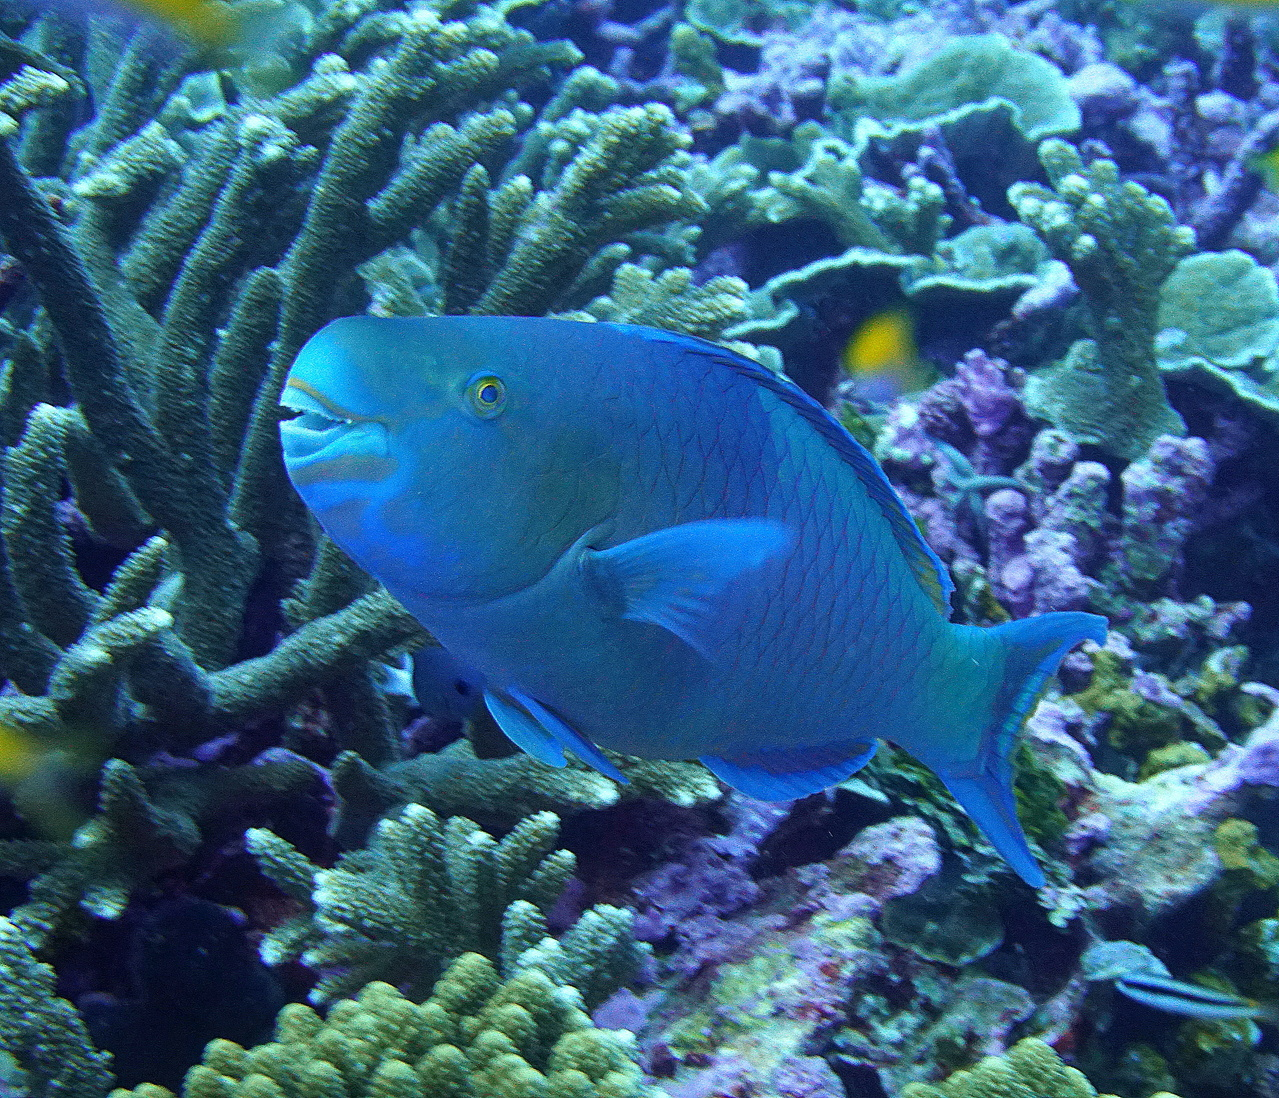 Parrotfish among corals.